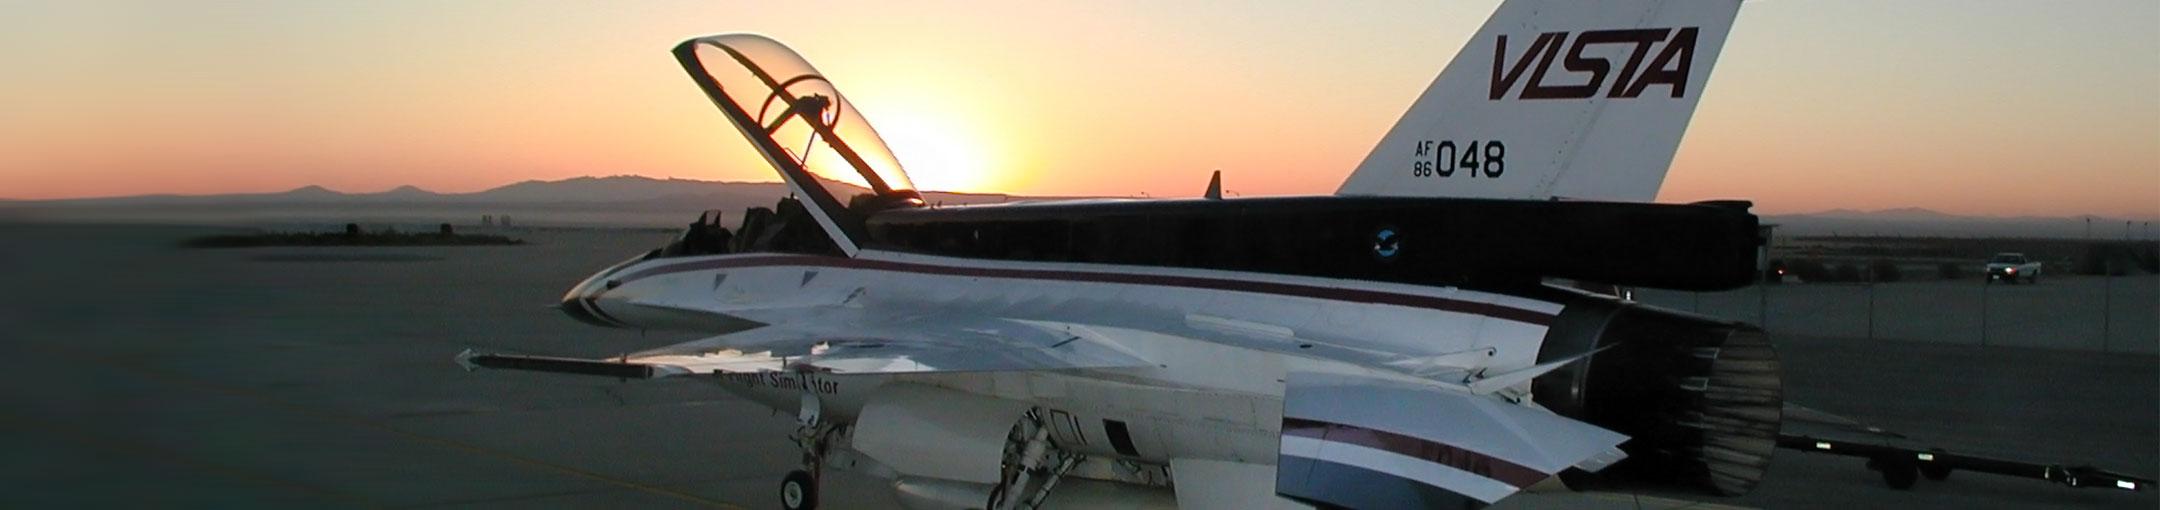 An flight simulator airplane at dusk.